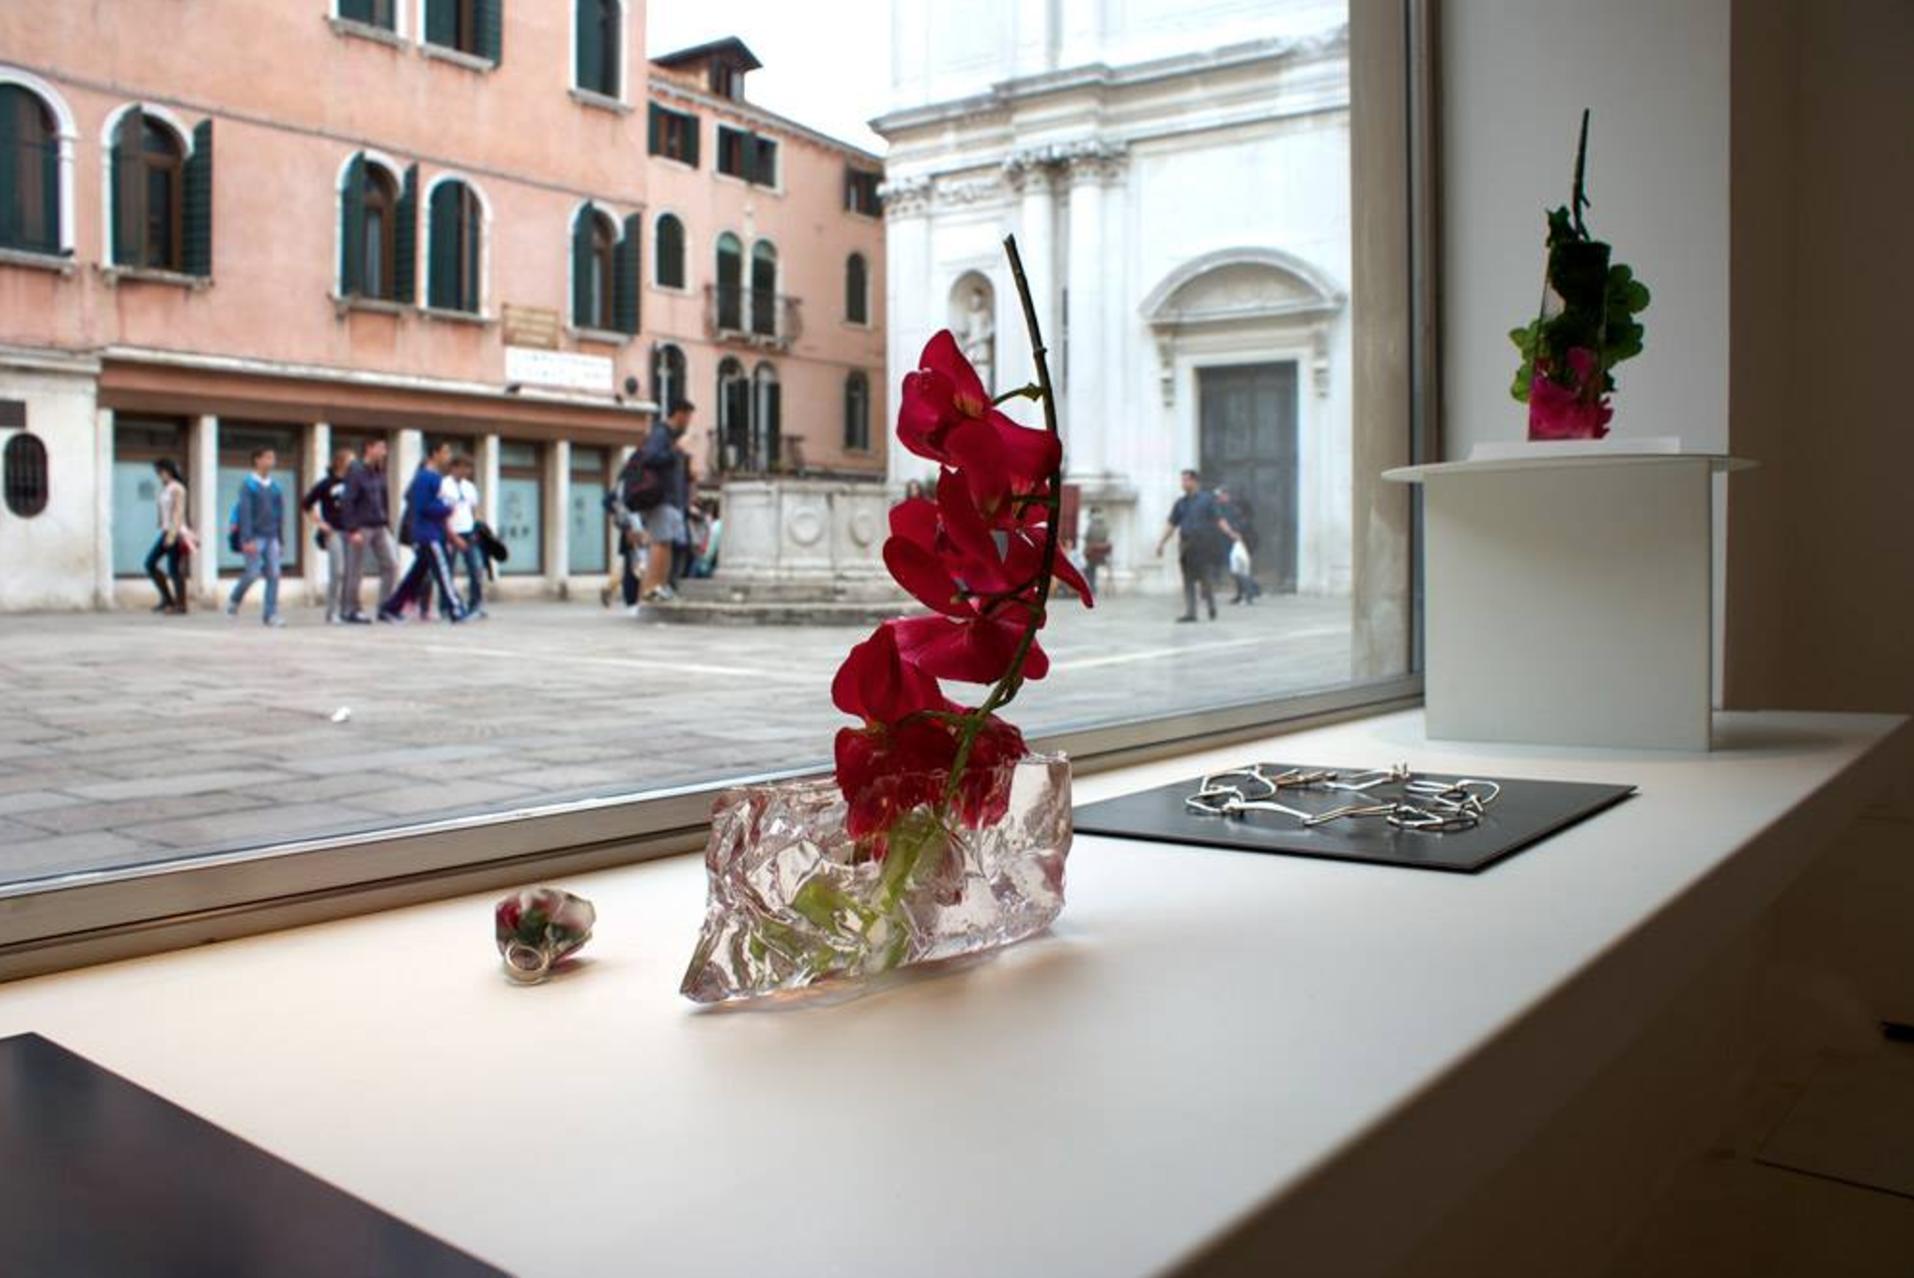 exhibition view,  Per domani , Catalina Brenes, 2014, OHMYBLUE, Venice, Italy, photo: OHMYBLUE